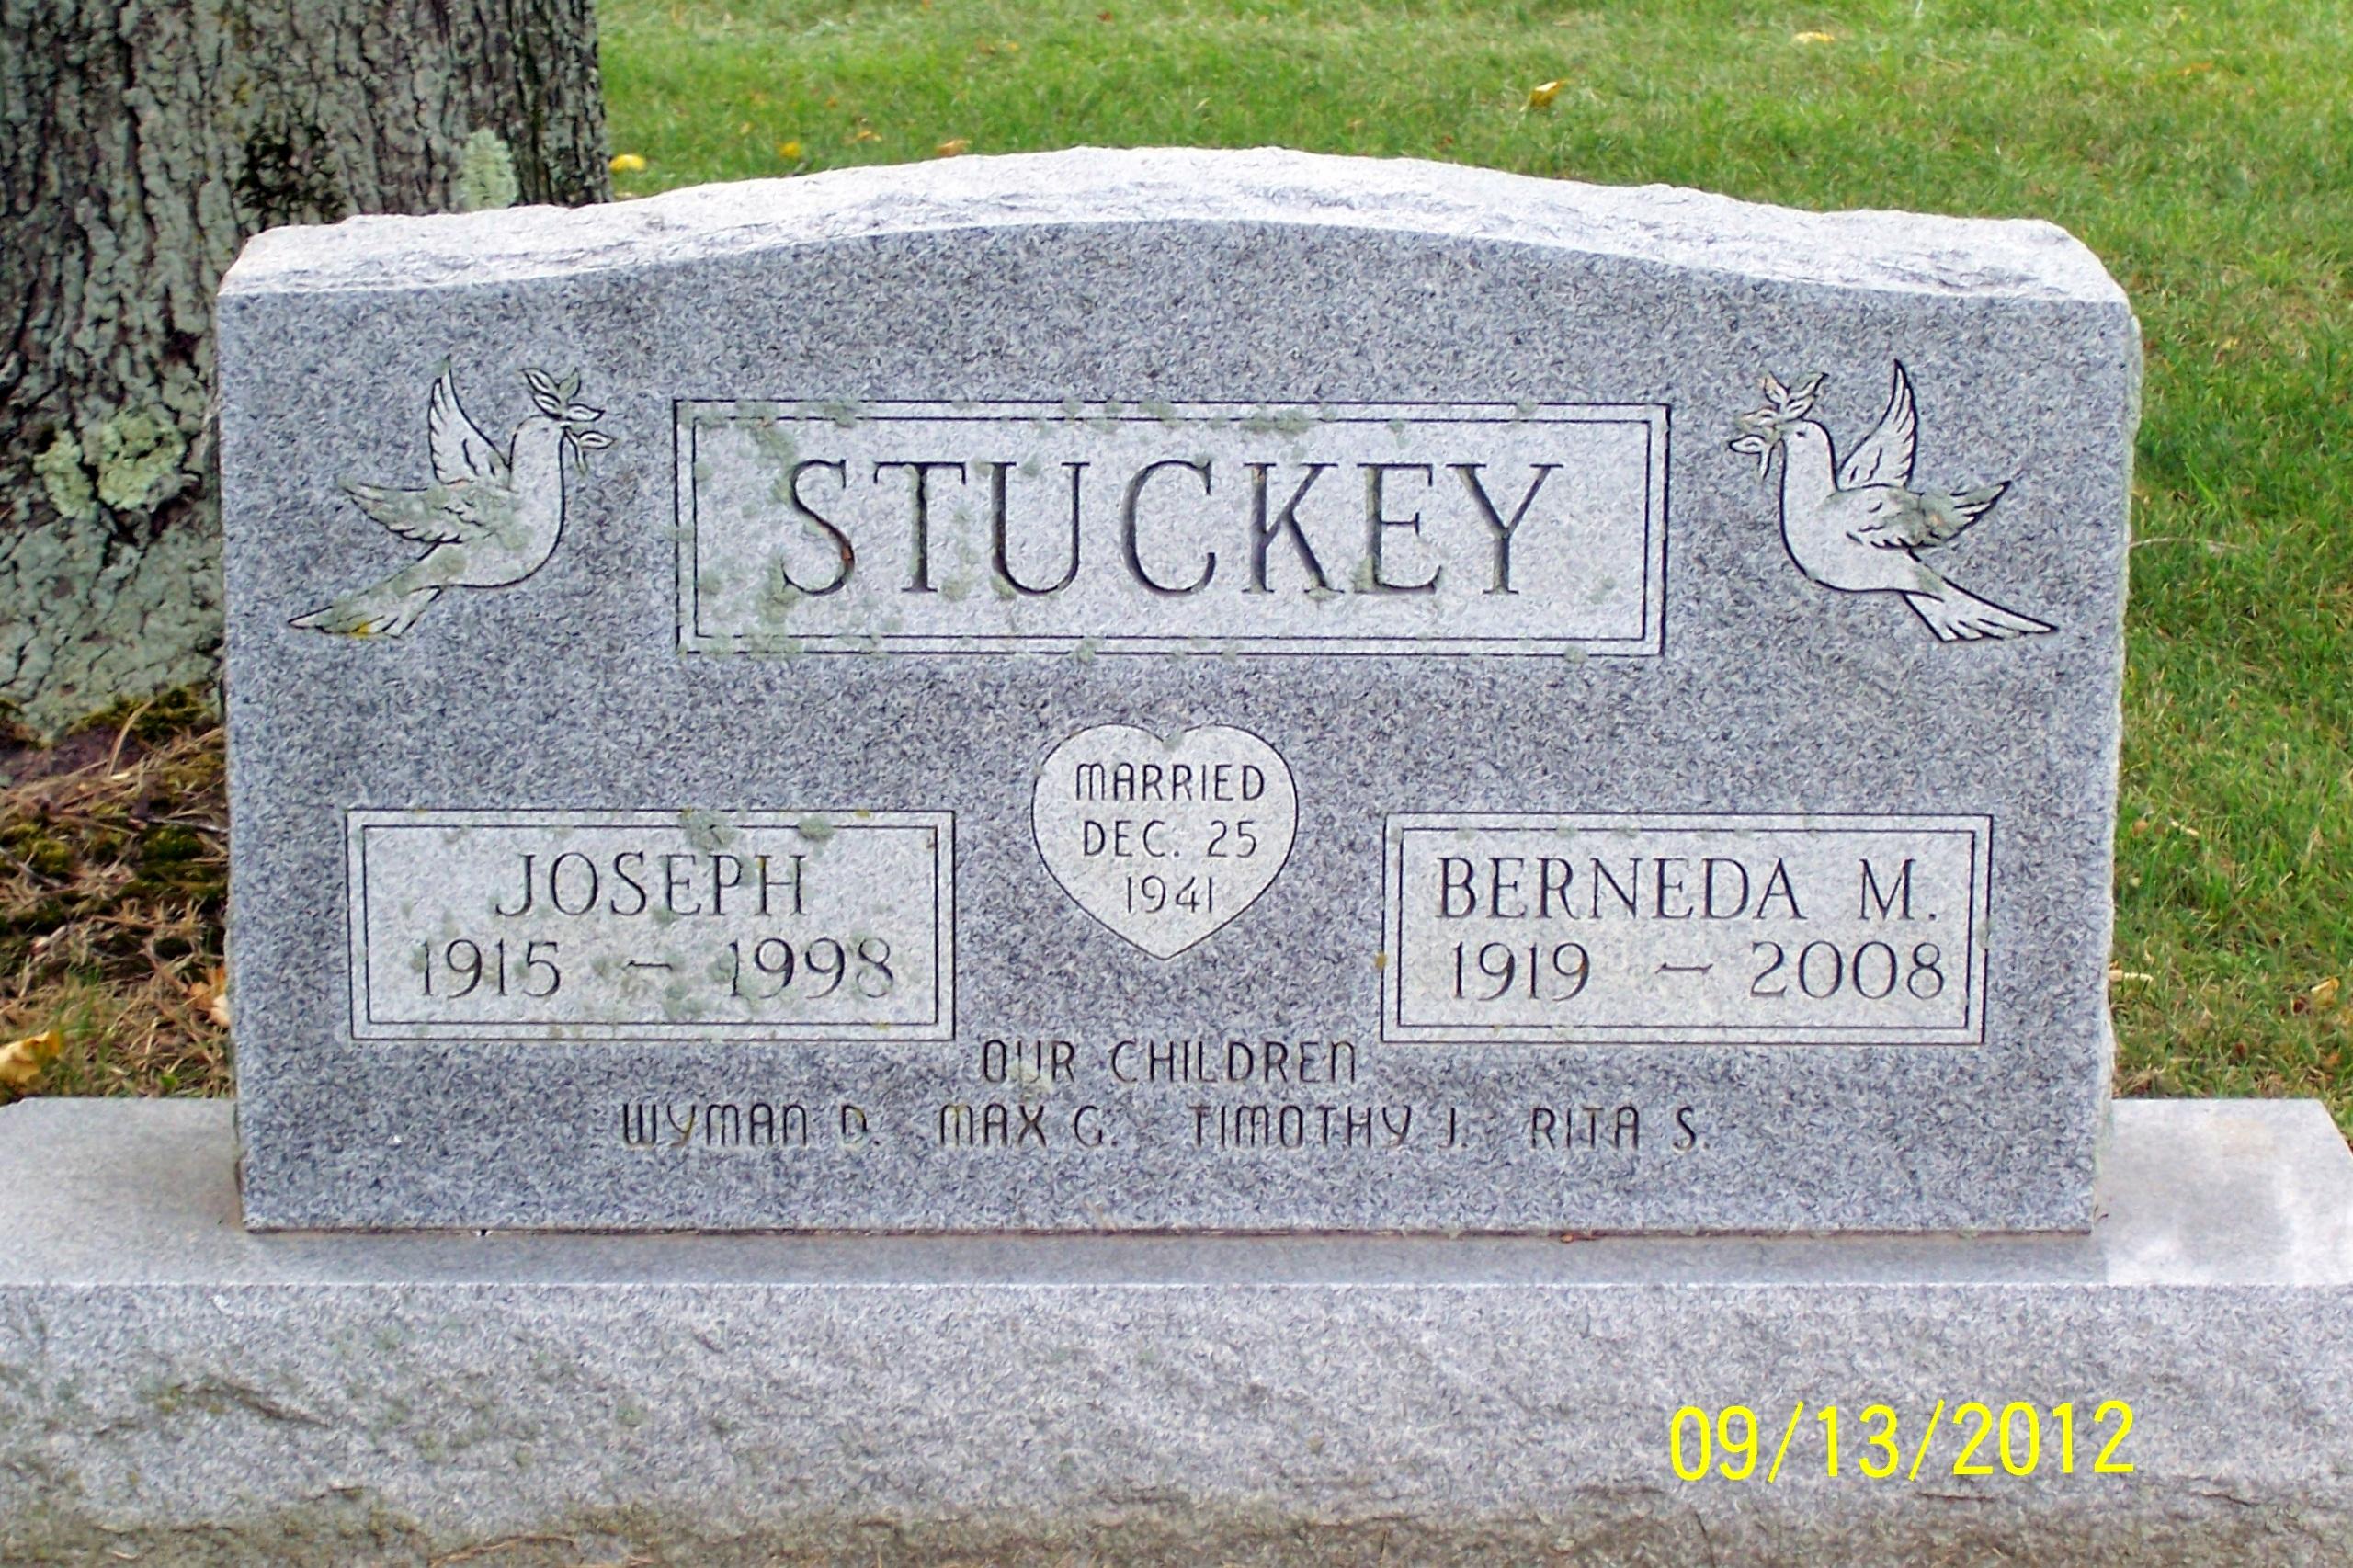 Joseph Stuckey